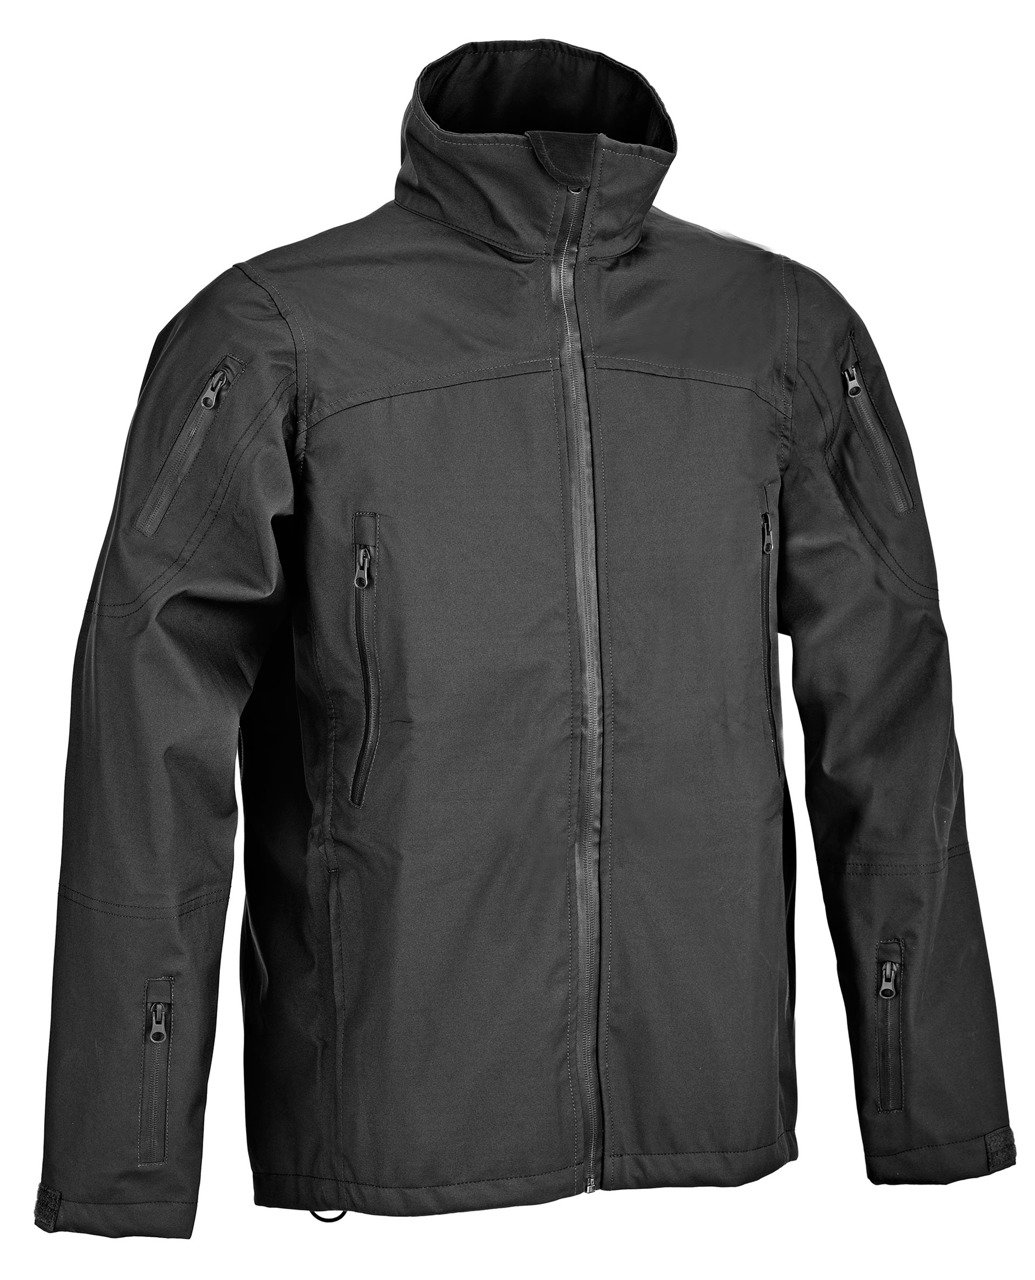 6adafb9f06b ... Black Duty Jacket: DUTY AQUA TEX® JACKET - Black